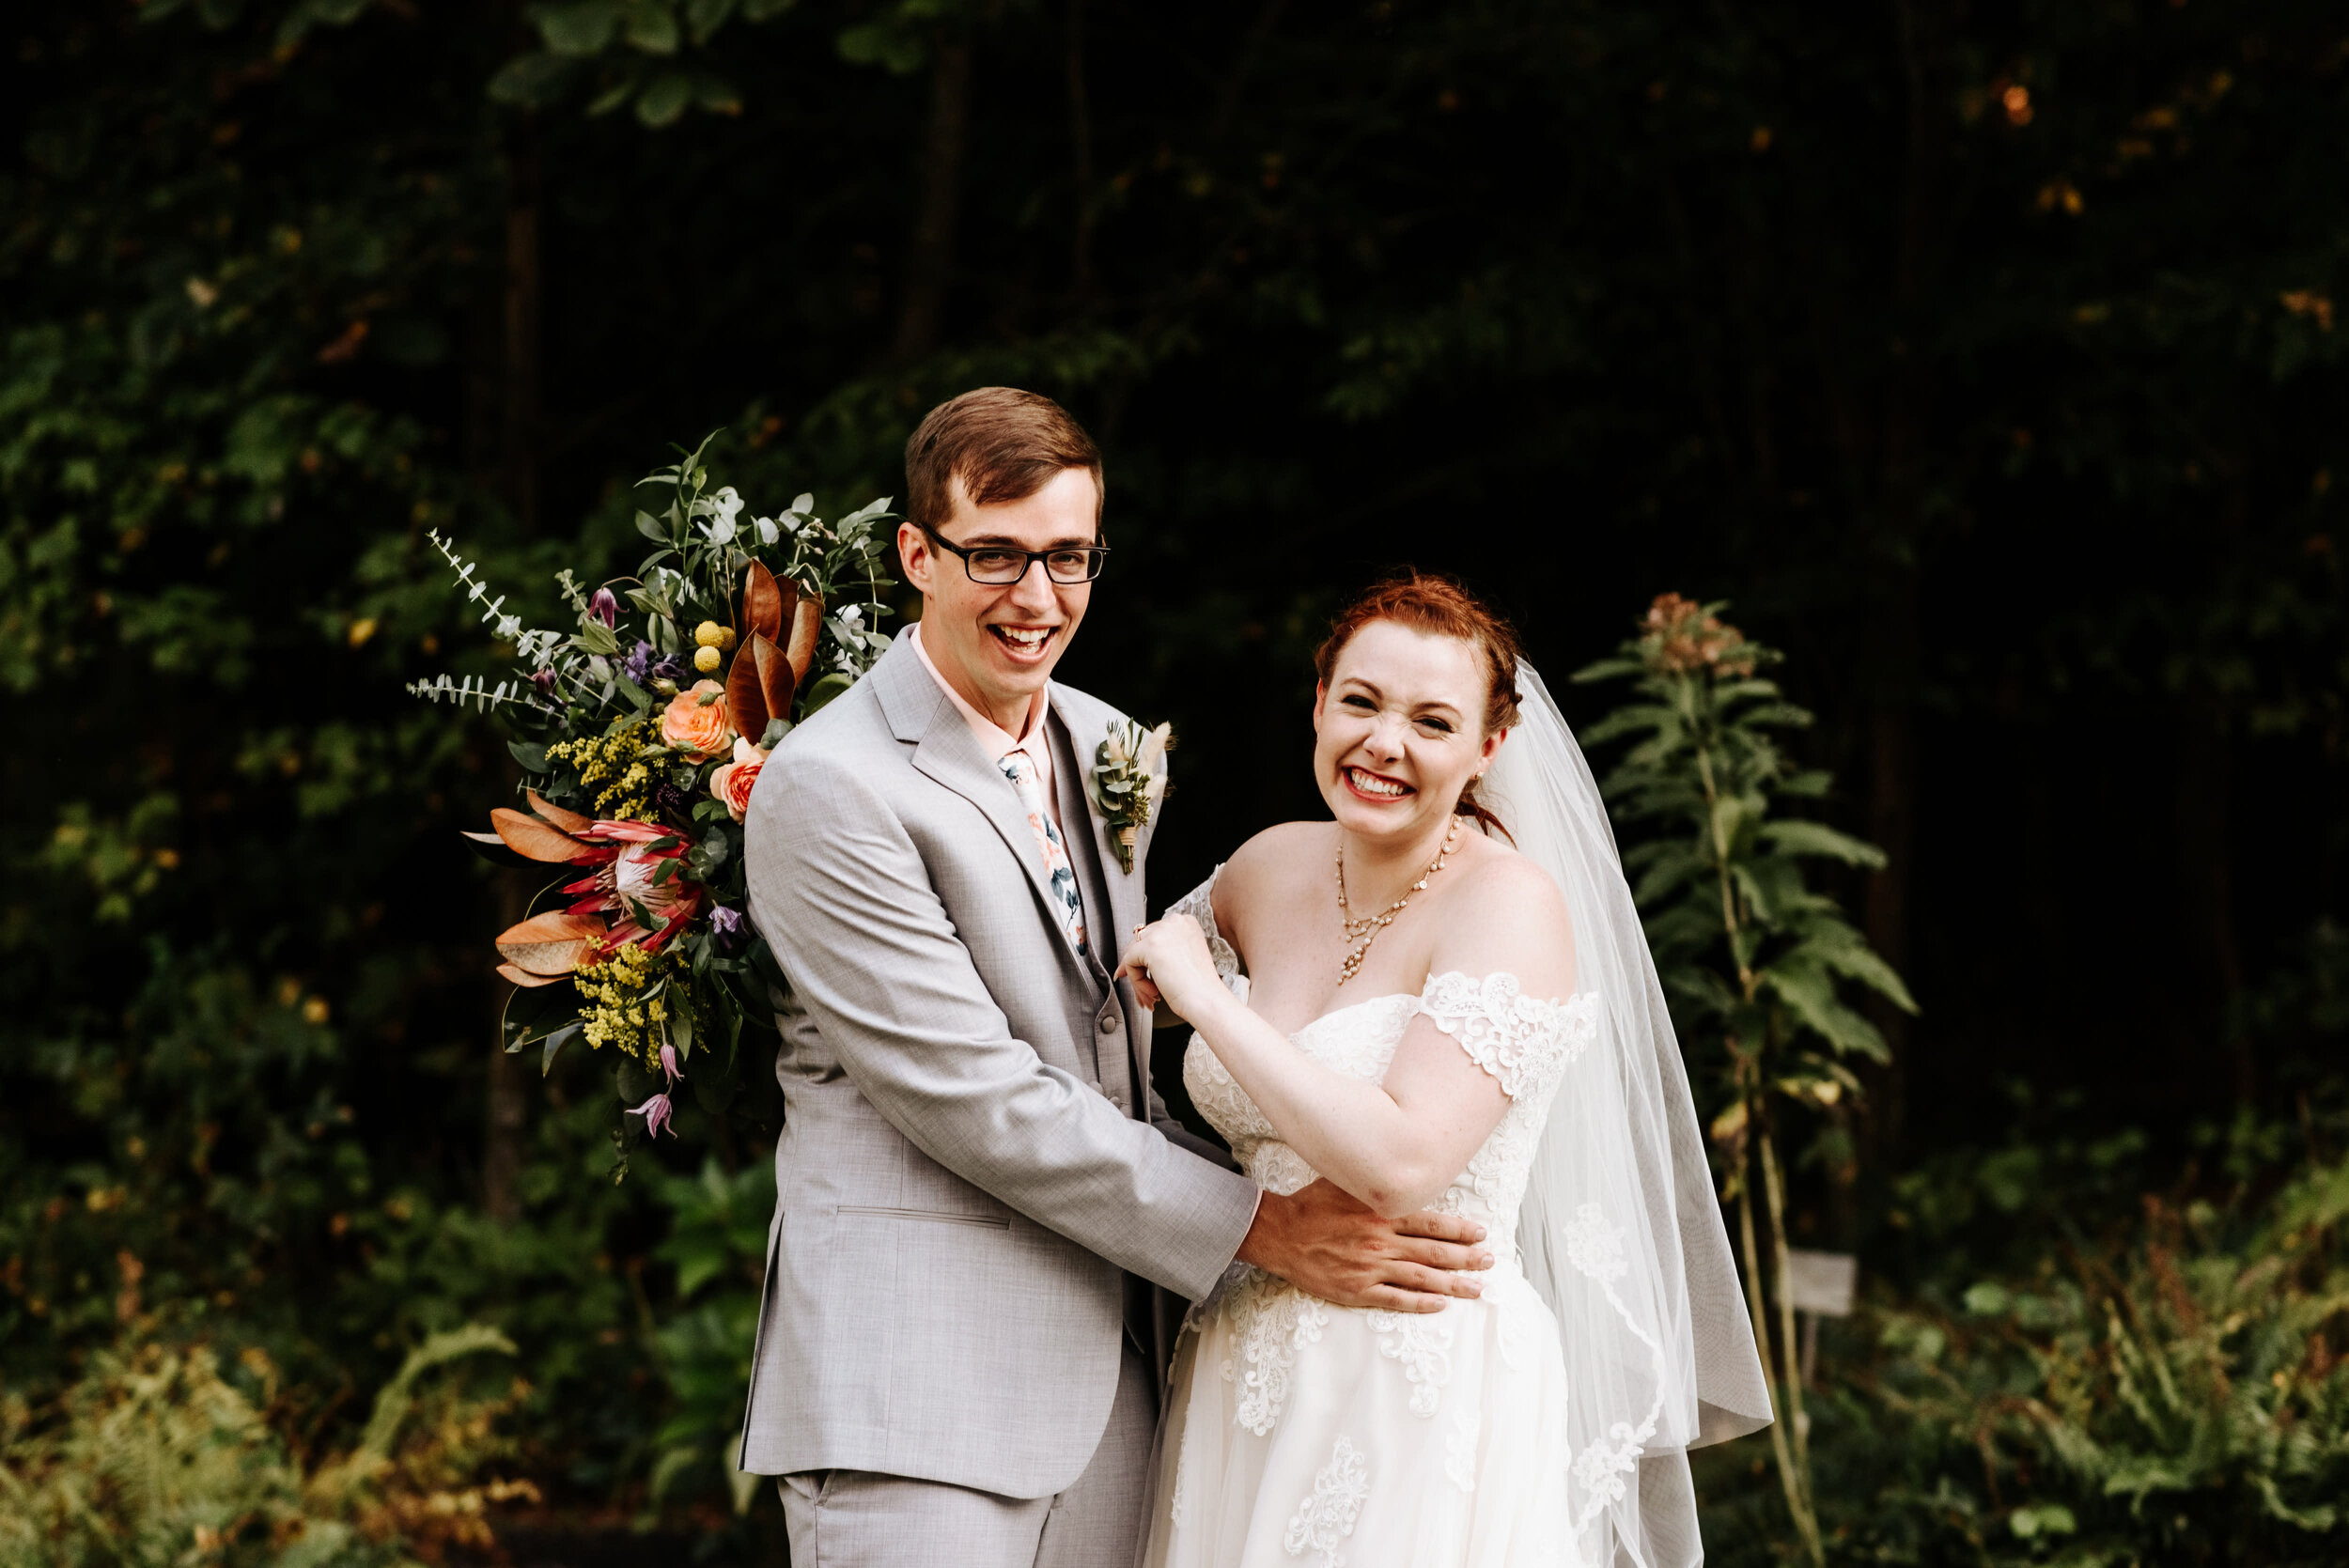 Rachel_David_Wedding_Richmond_Virginia_Photography_by_V_47.jpg